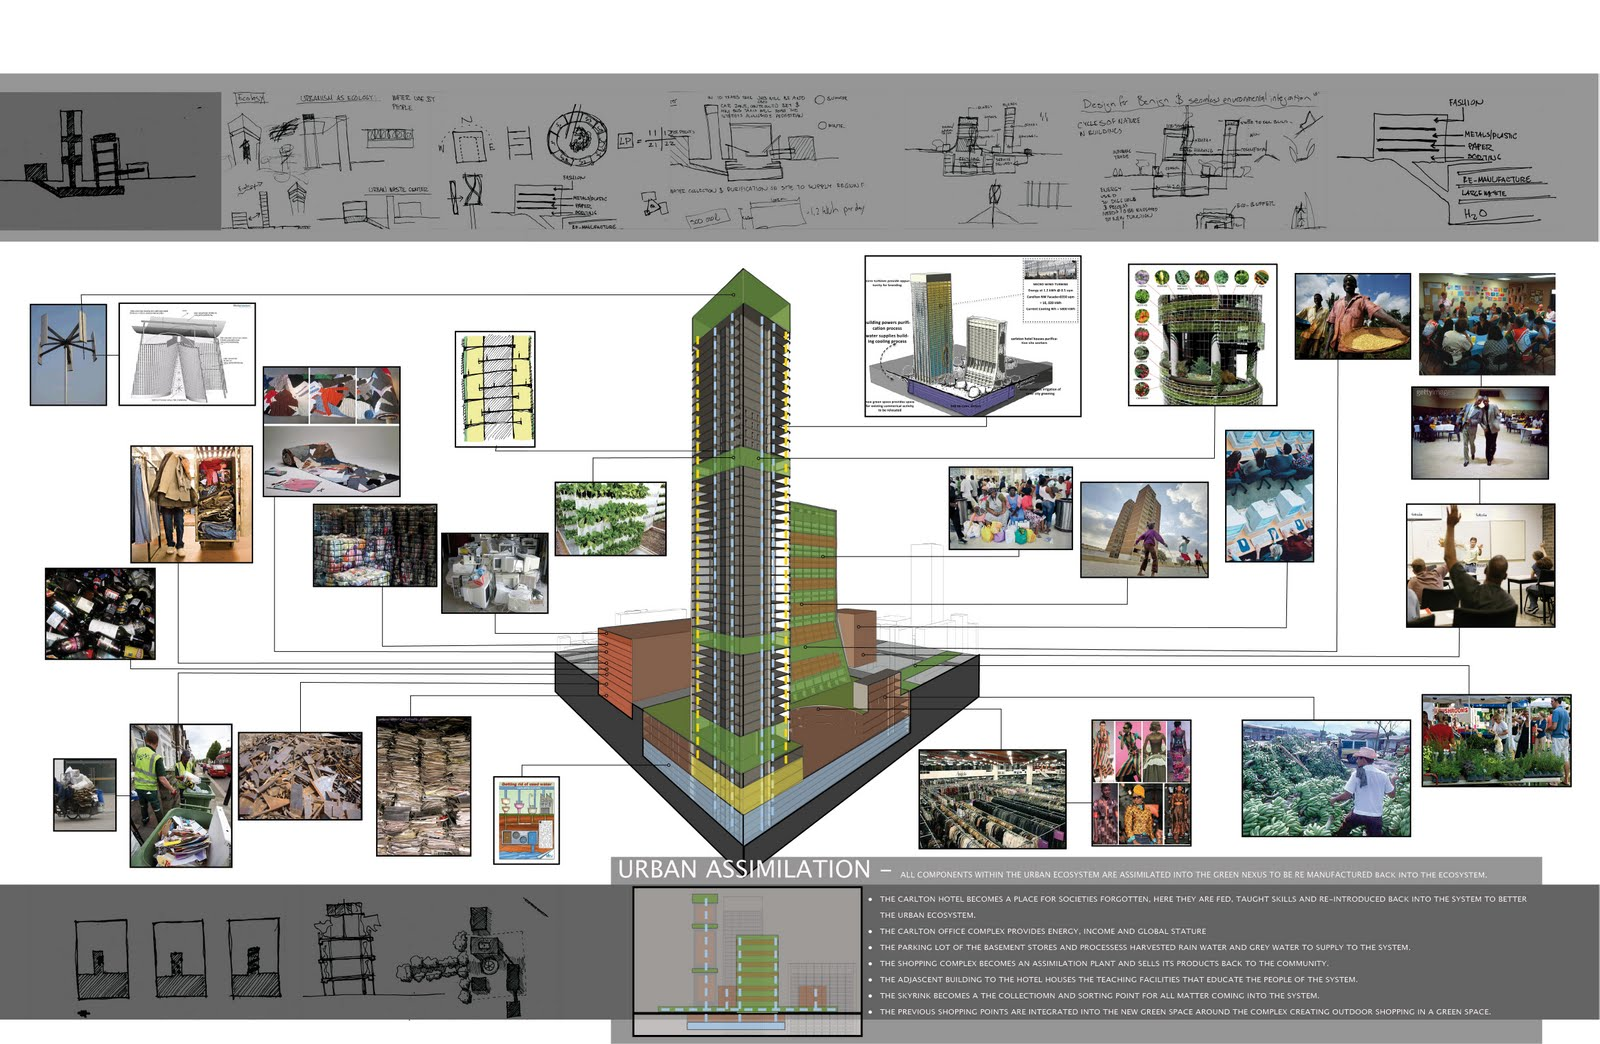 basement-parking-design Images - Frompo - 1